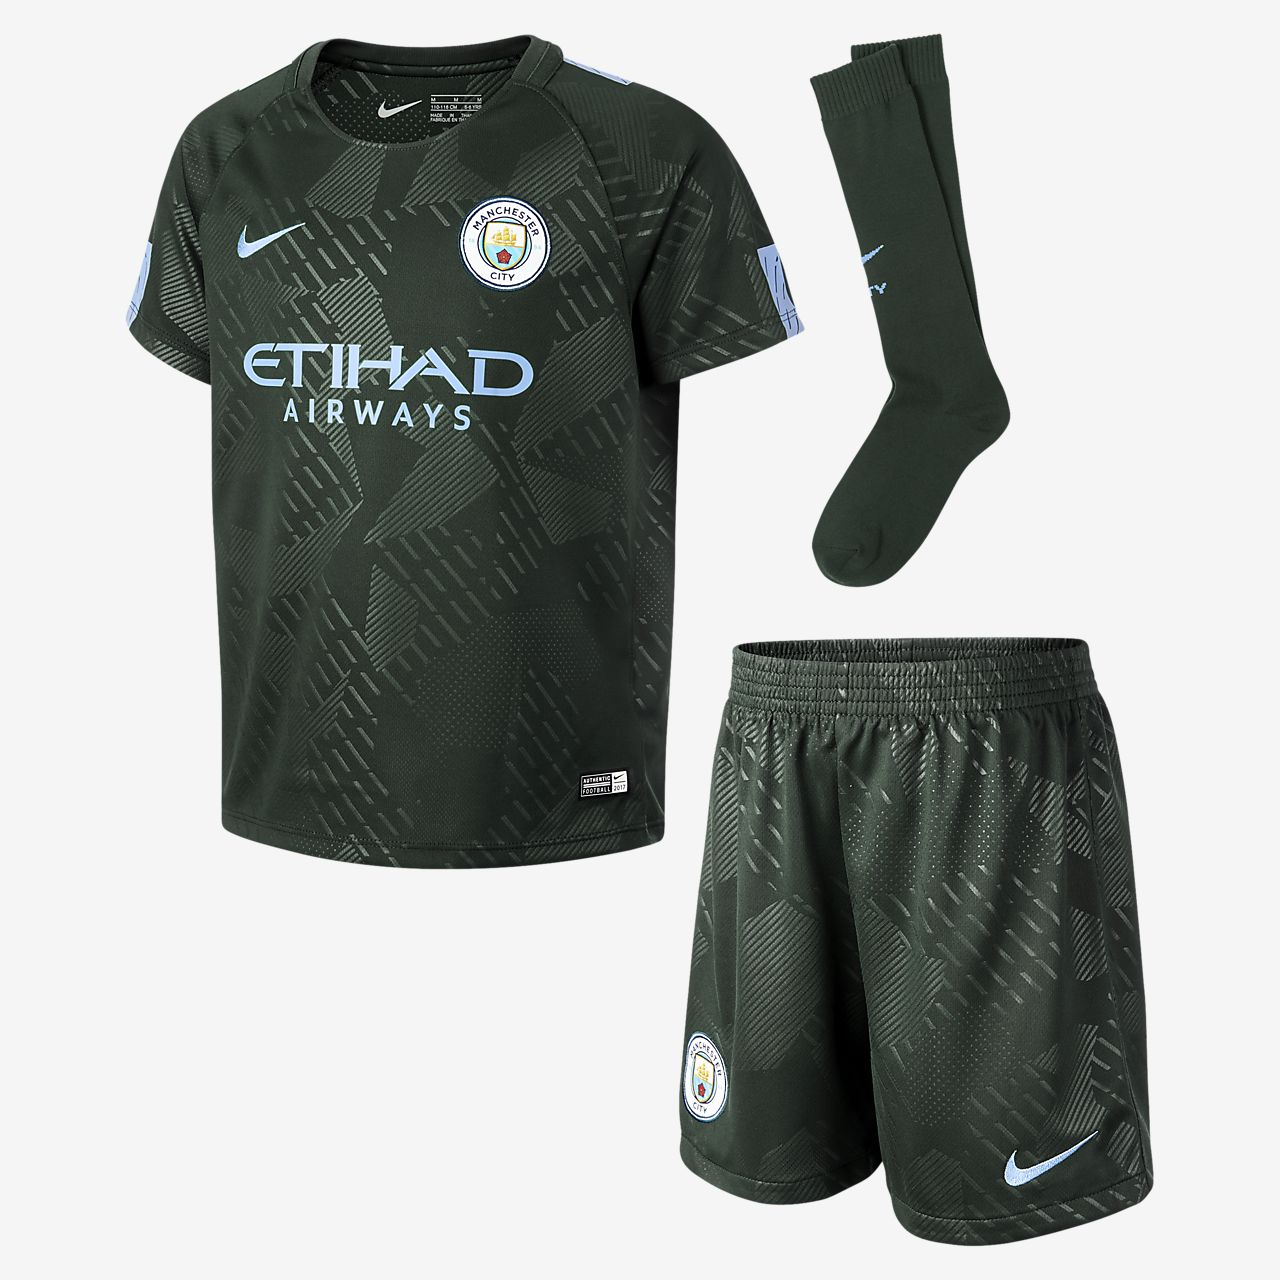 ... 2017/18 Manchester City FC Stadium Third Younger Kids' Football Kit